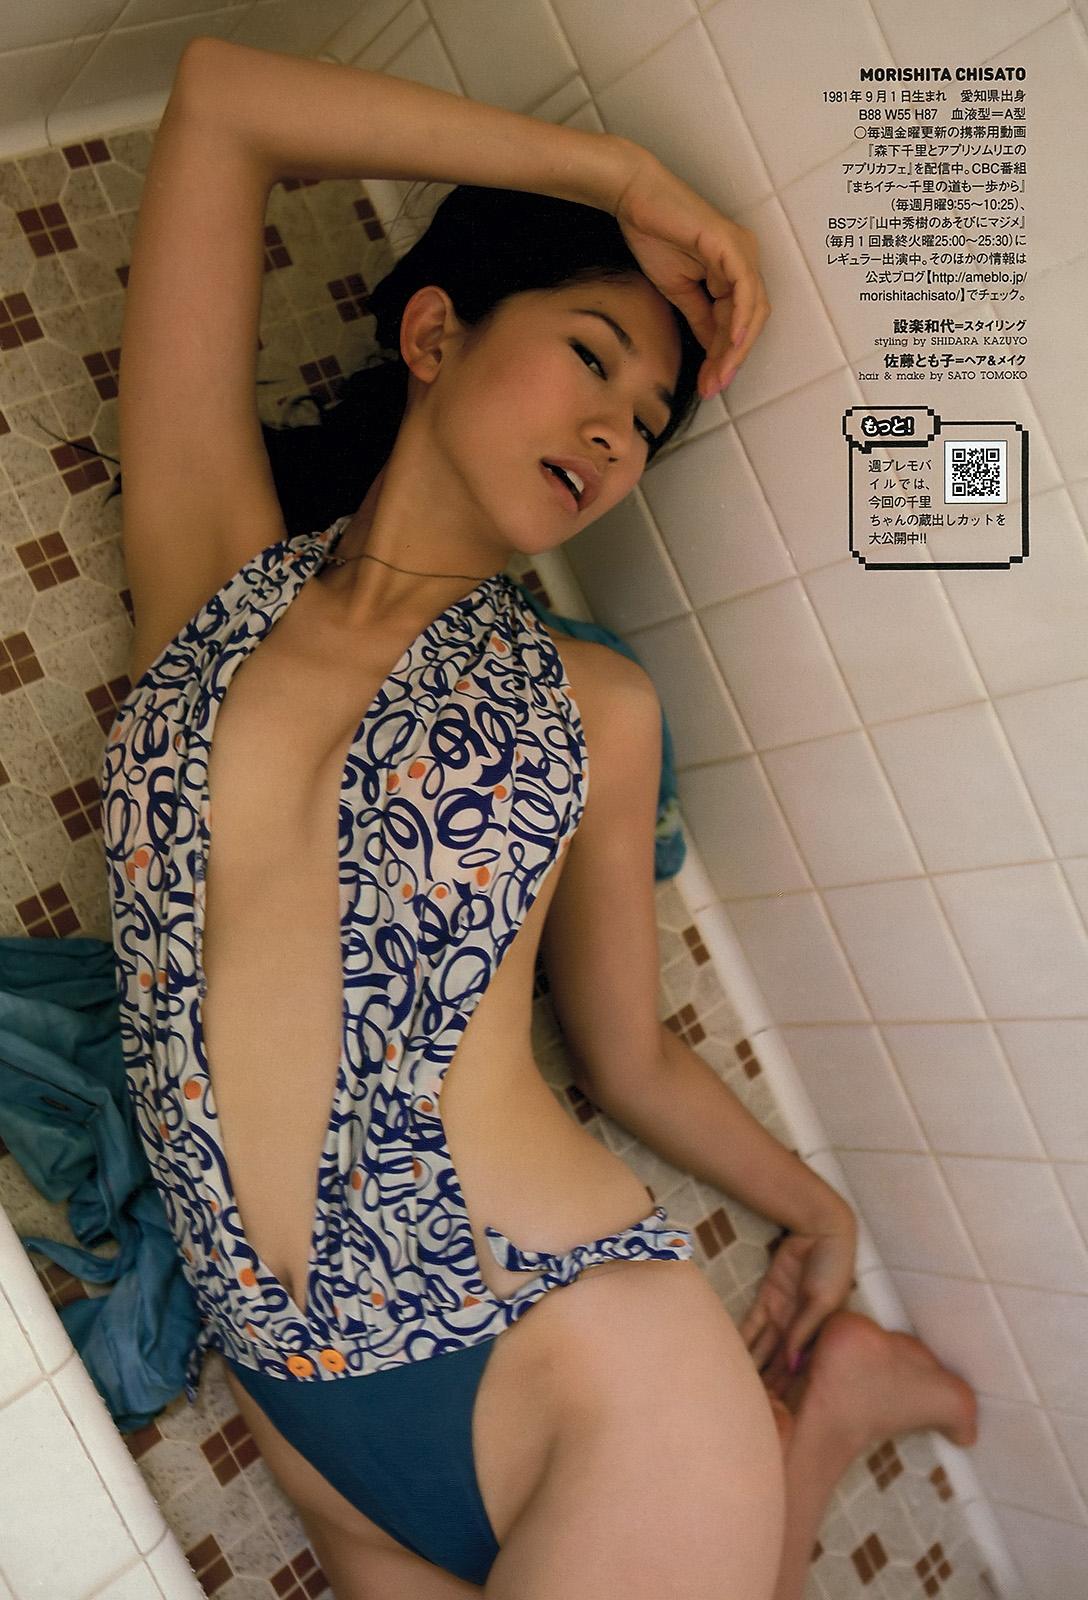 image http://scanlover.com/assets/images/6980-wbWPn9kbUVy4e6Yf.jpeg